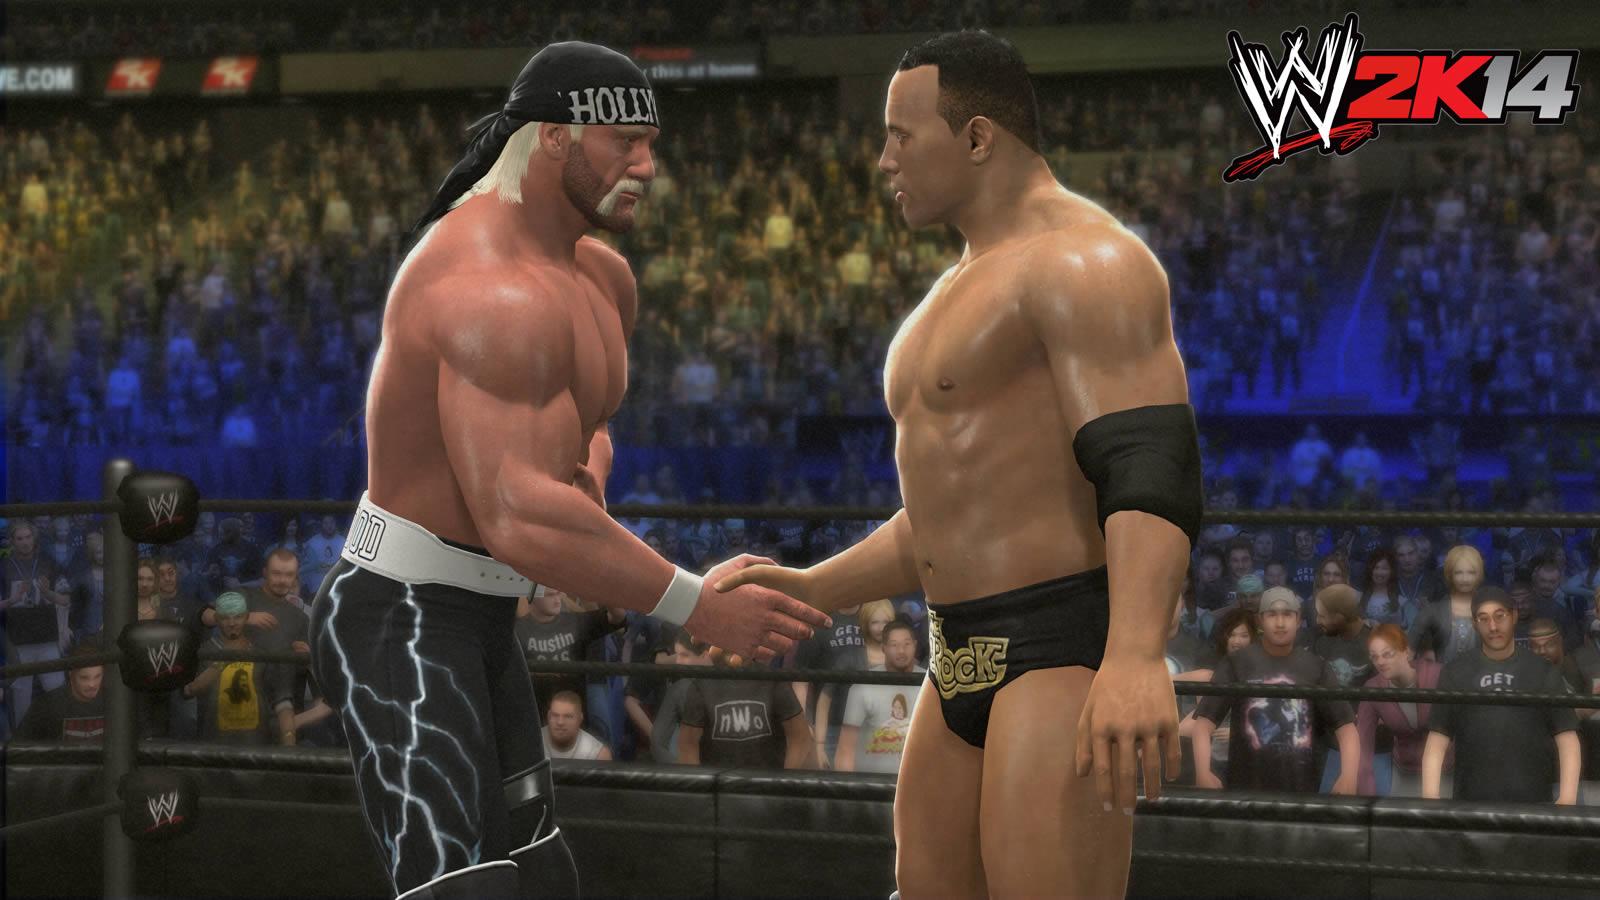 WWE 2K14 revive las mejores peleas de la lucha libre. (Internet)